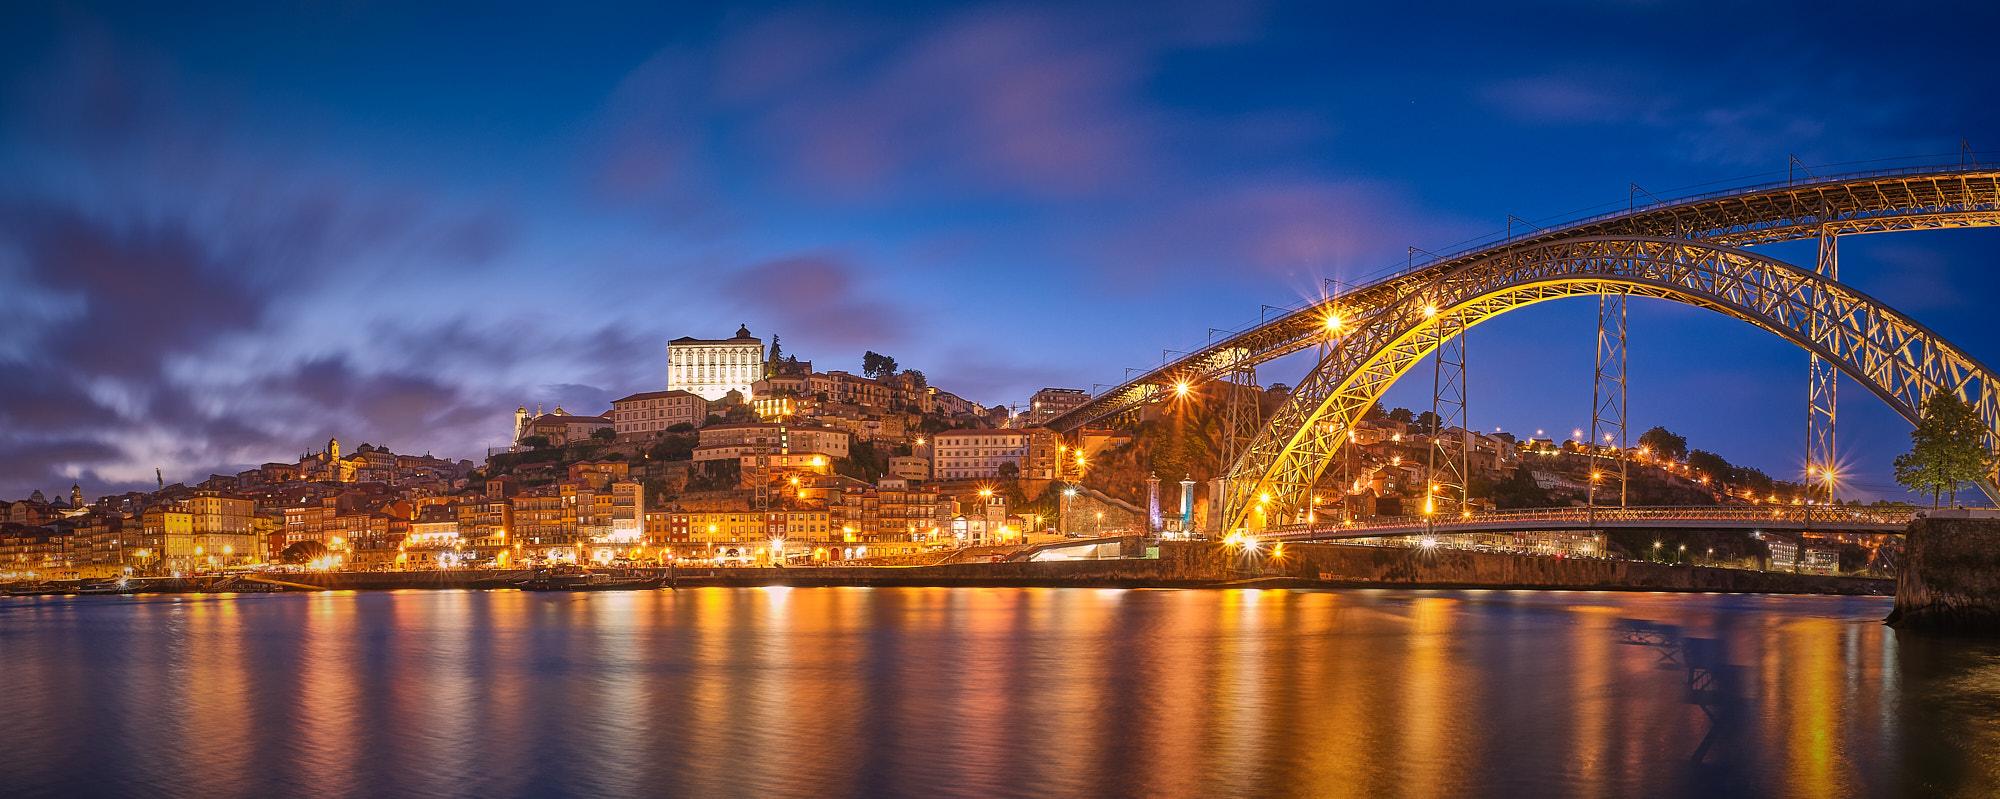 Roman Martin-Porto